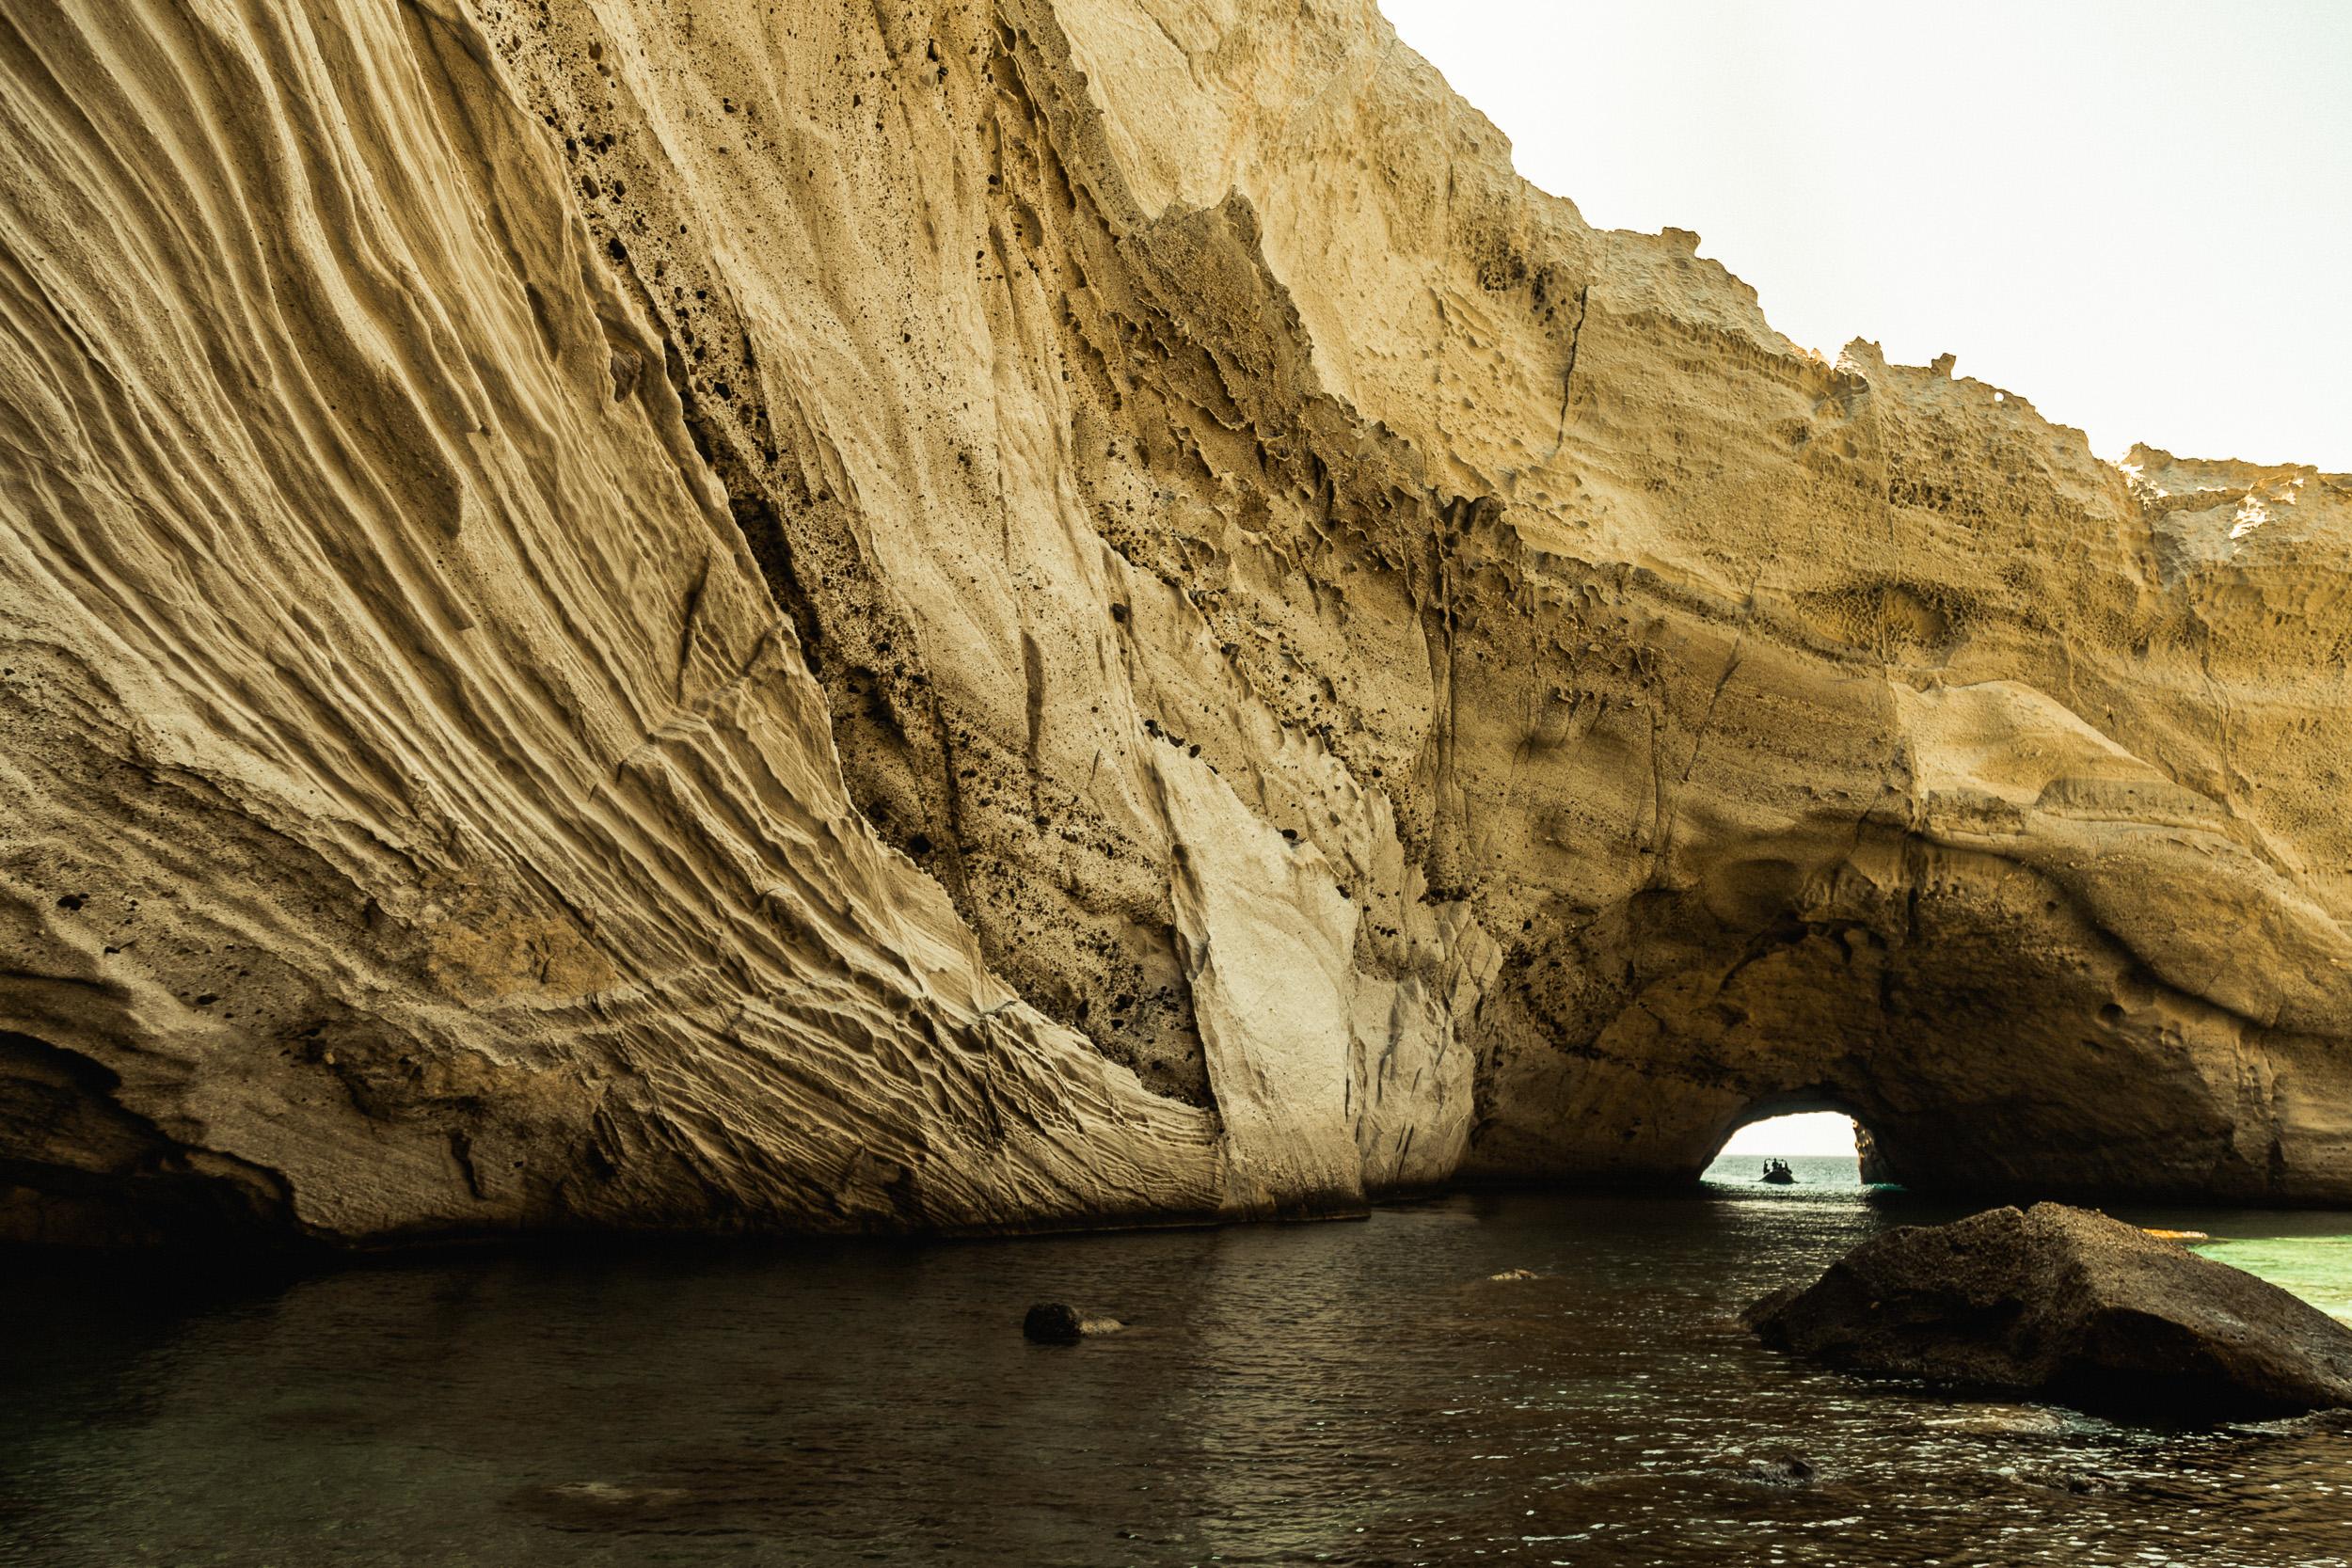 06-milos-greece-island-cyclades-boat-anna-elina-lahti-photographer.jpg